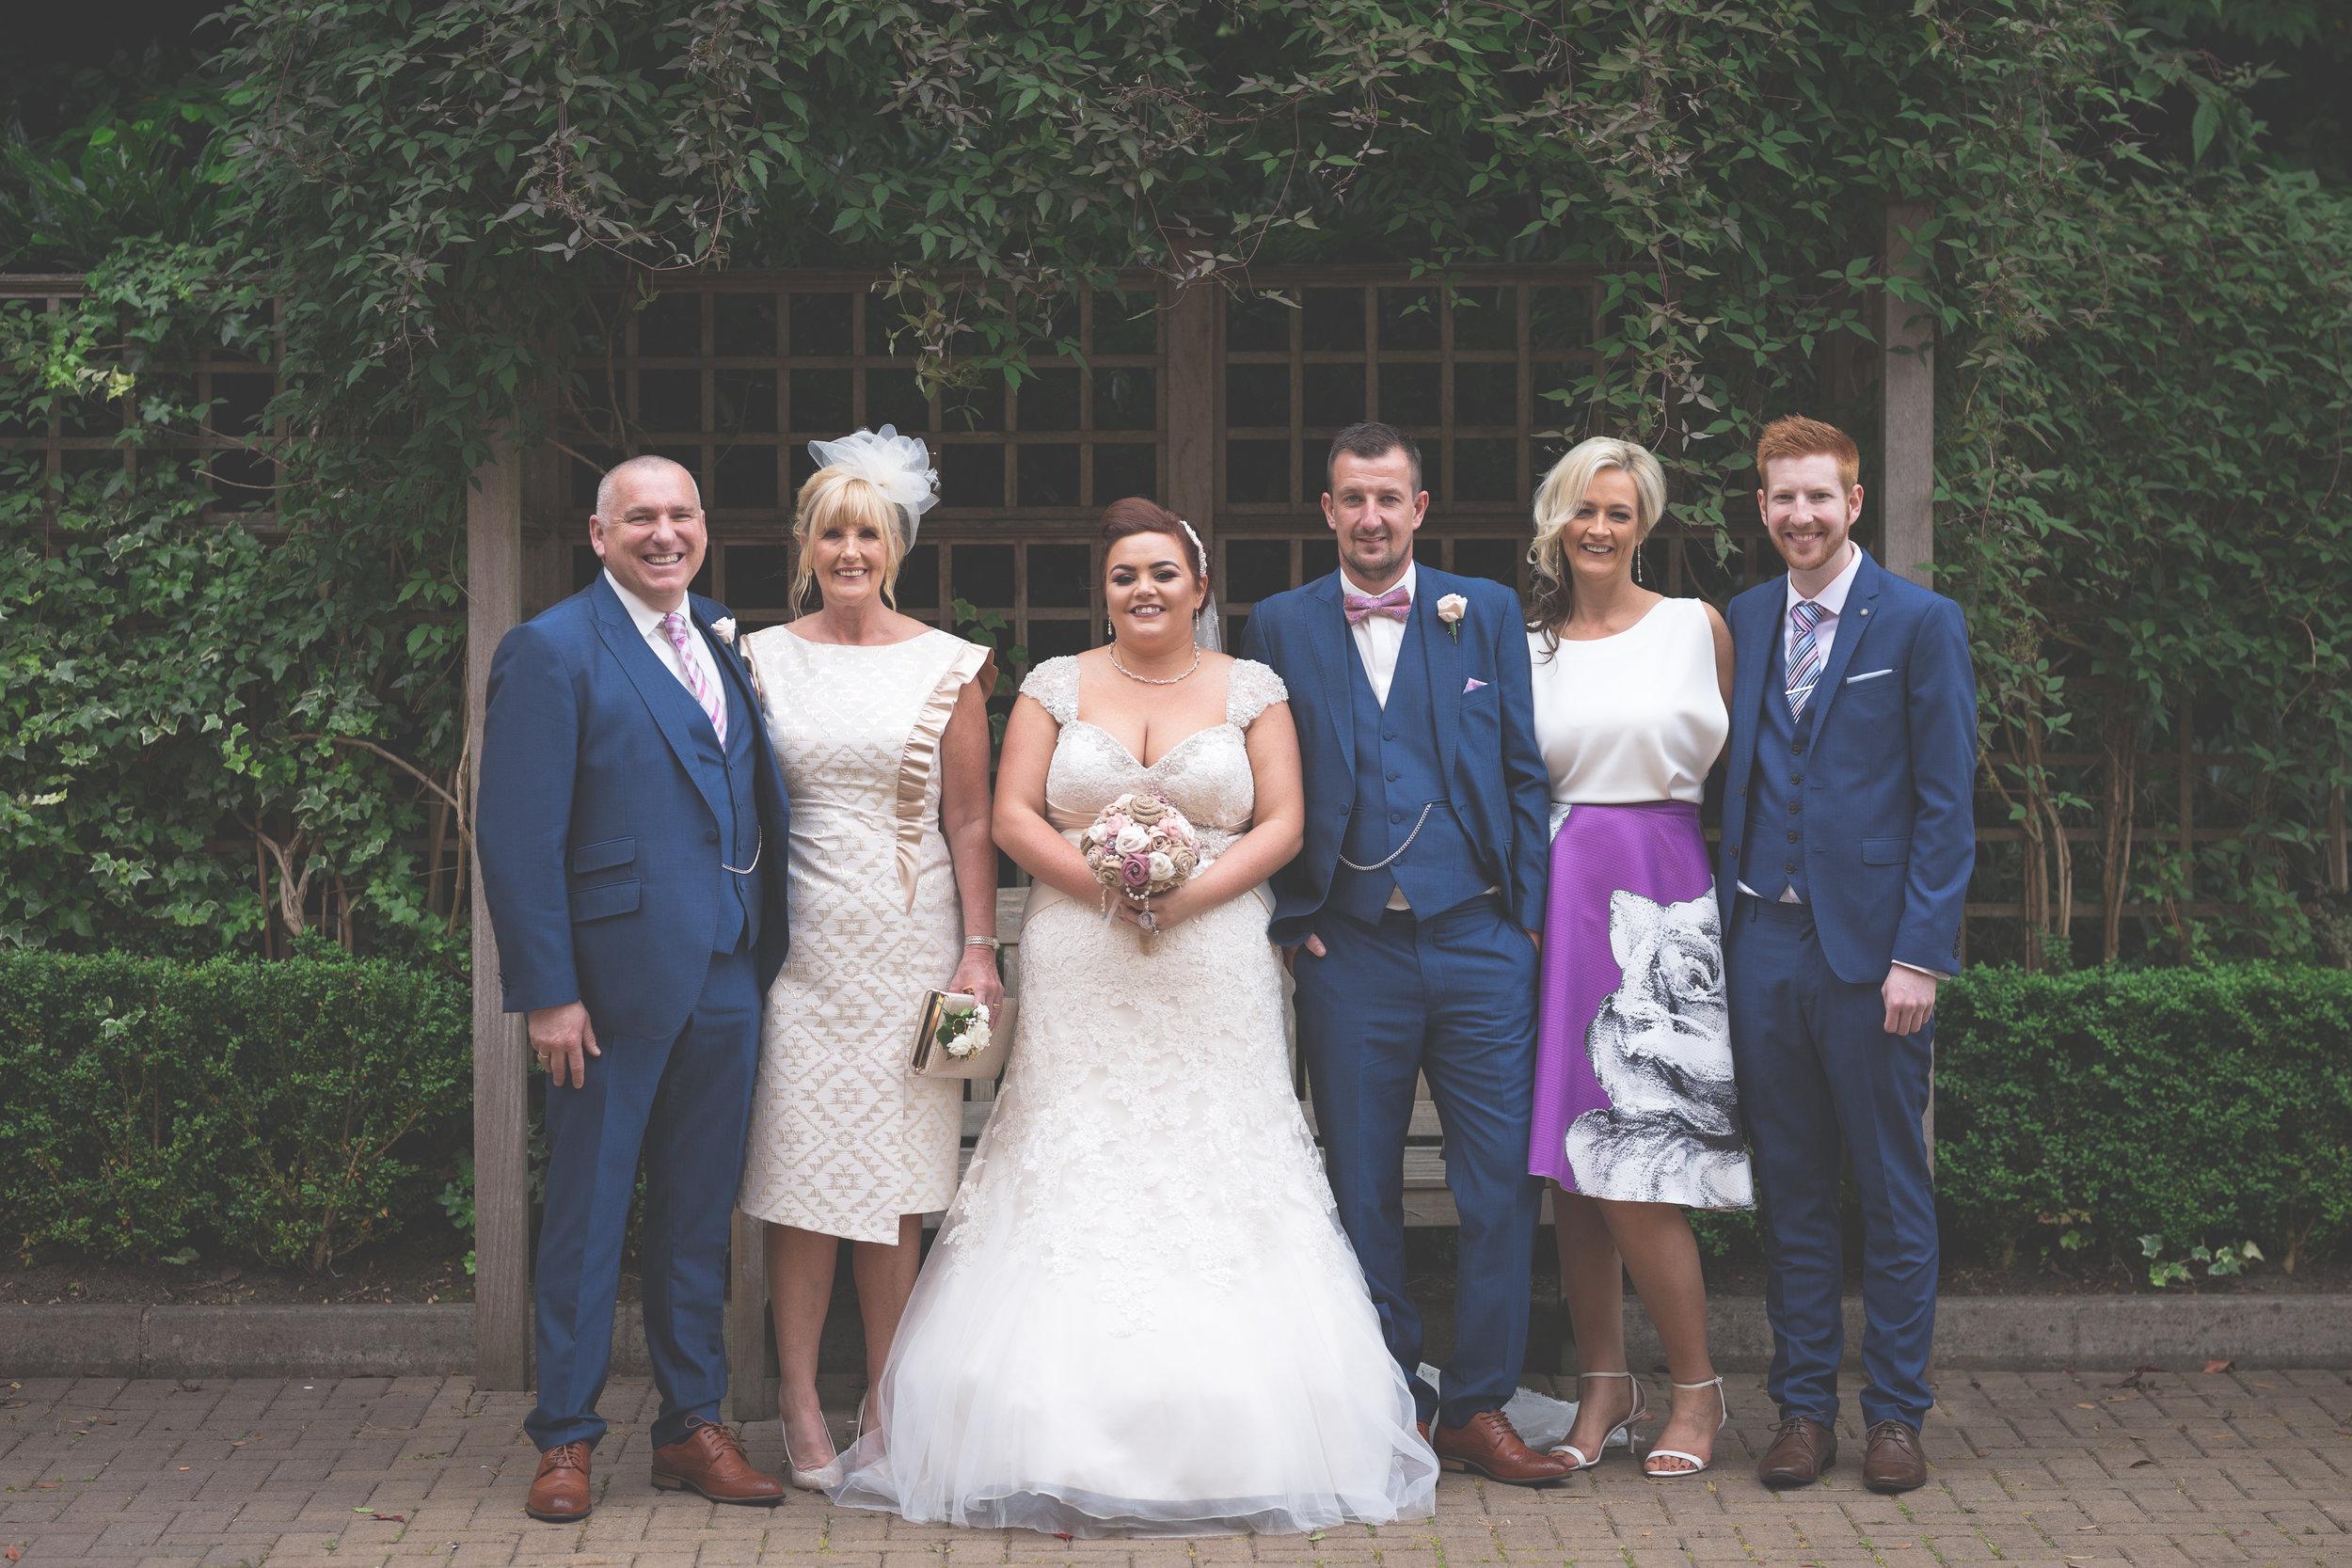 Antoinette & Stephen - Portraits   Brian McEwan Photography   Wedding Photographer Northern Ireland 64.jpg